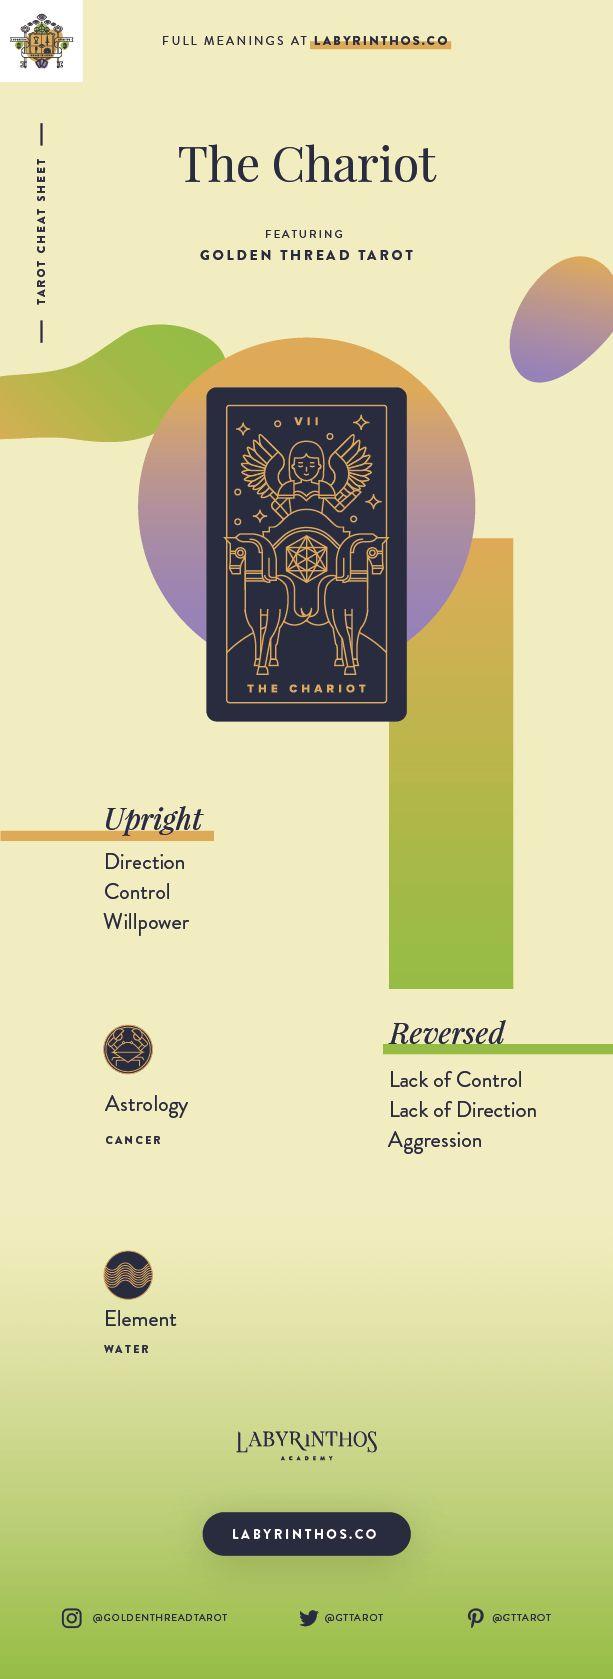 The Chariot Meaning - Tarot Card Meanings Cheat Sheet. Art from Golden Thread Tarot.